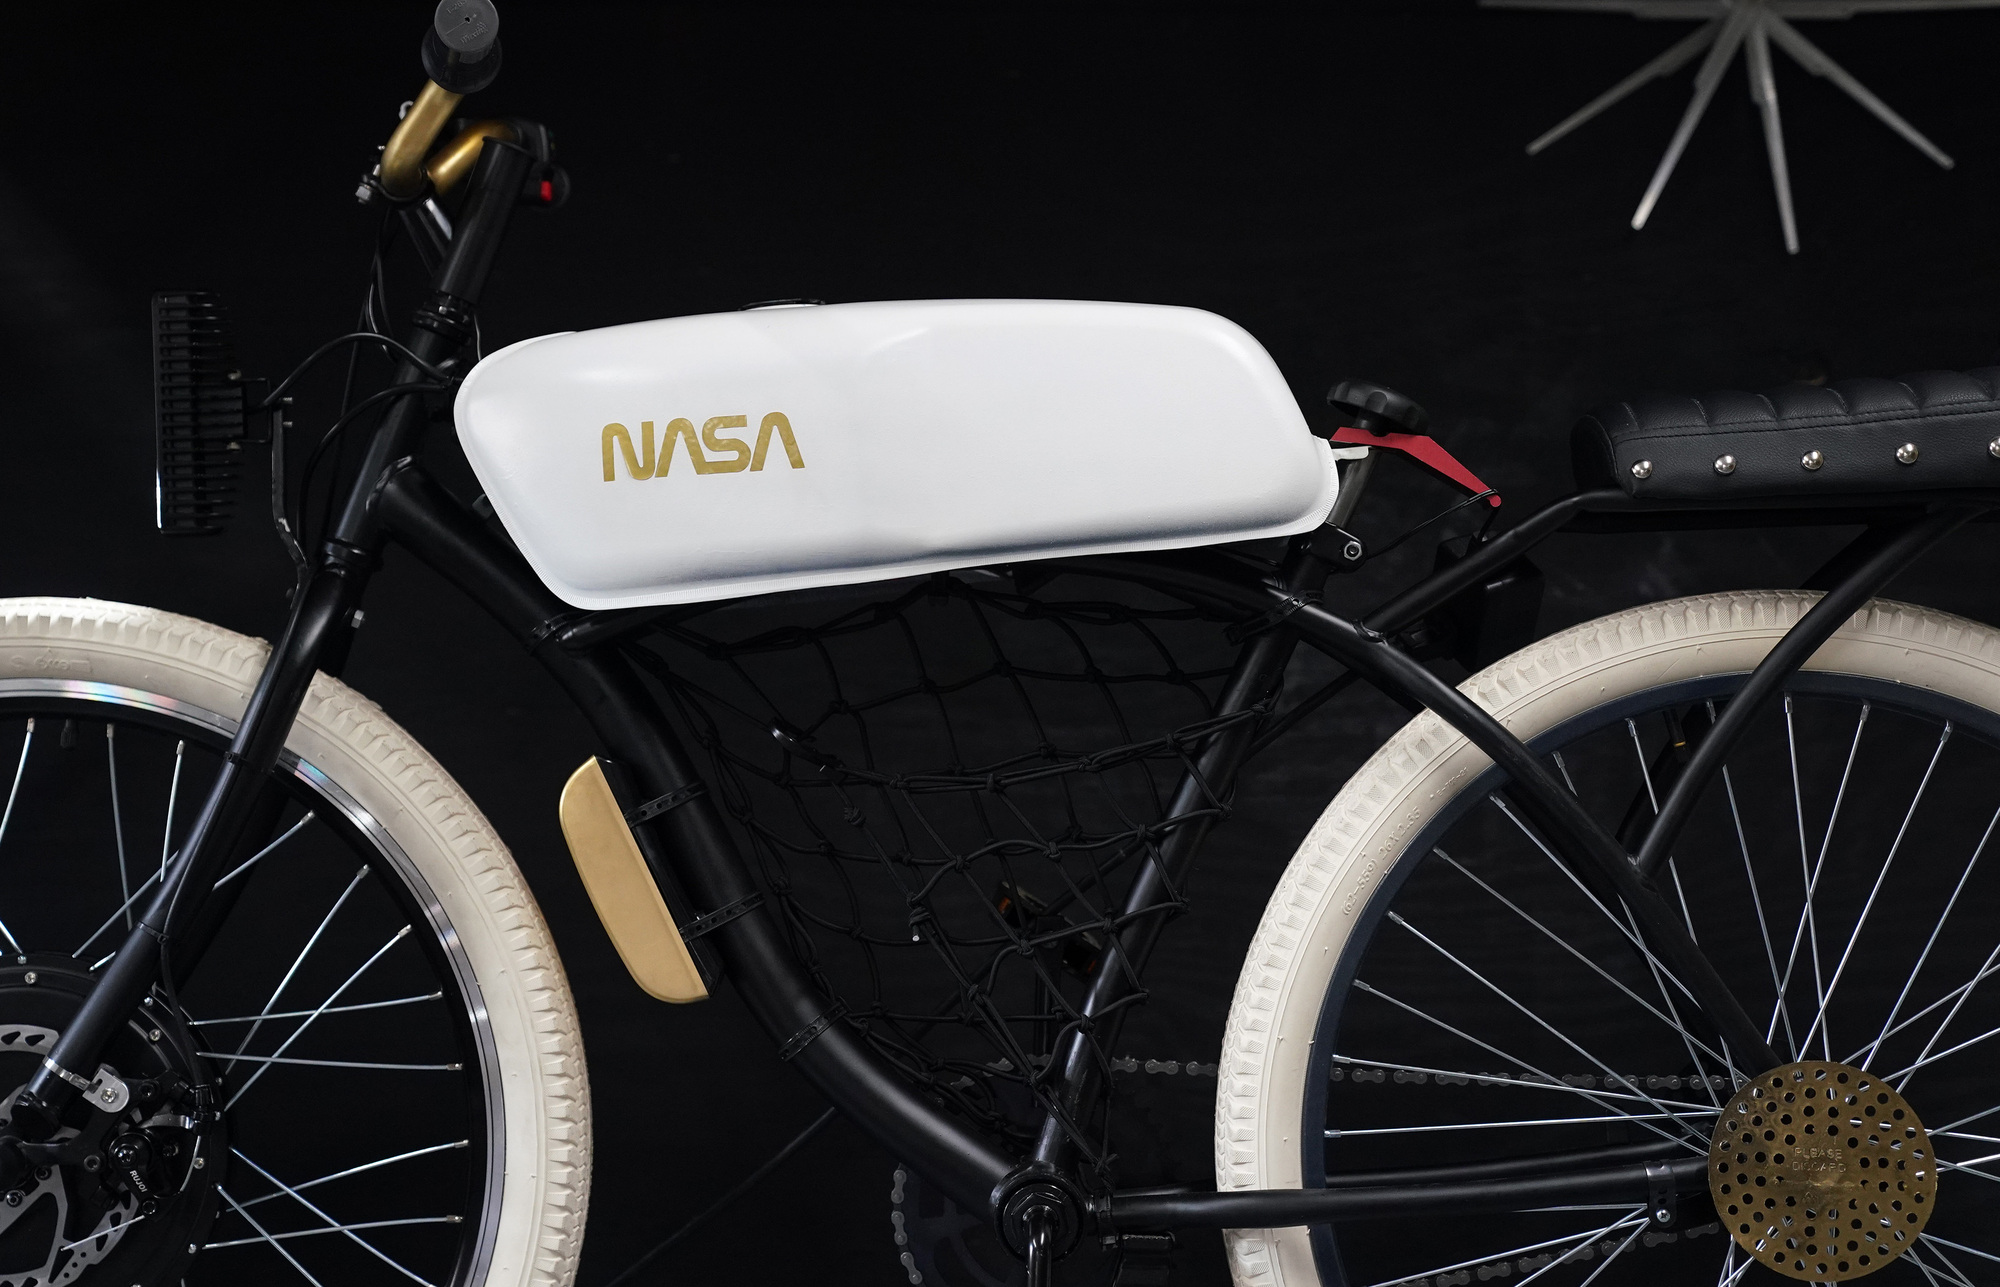 Detail of the NASA bike.